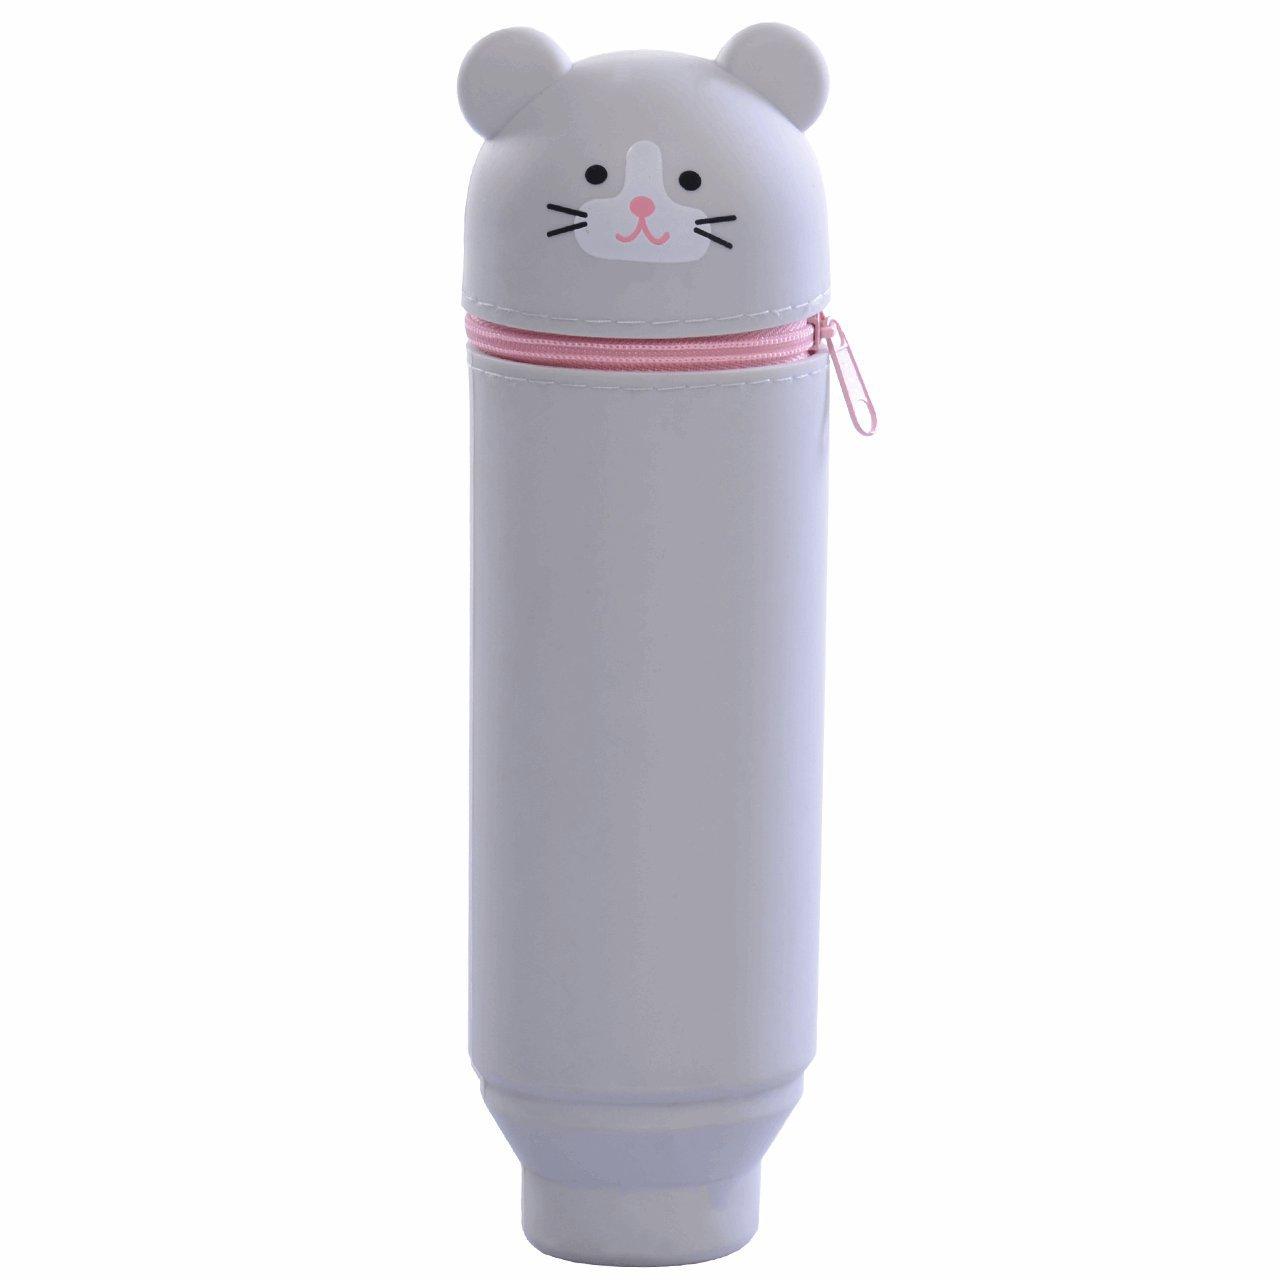 جامدادی کپ مدل گربه